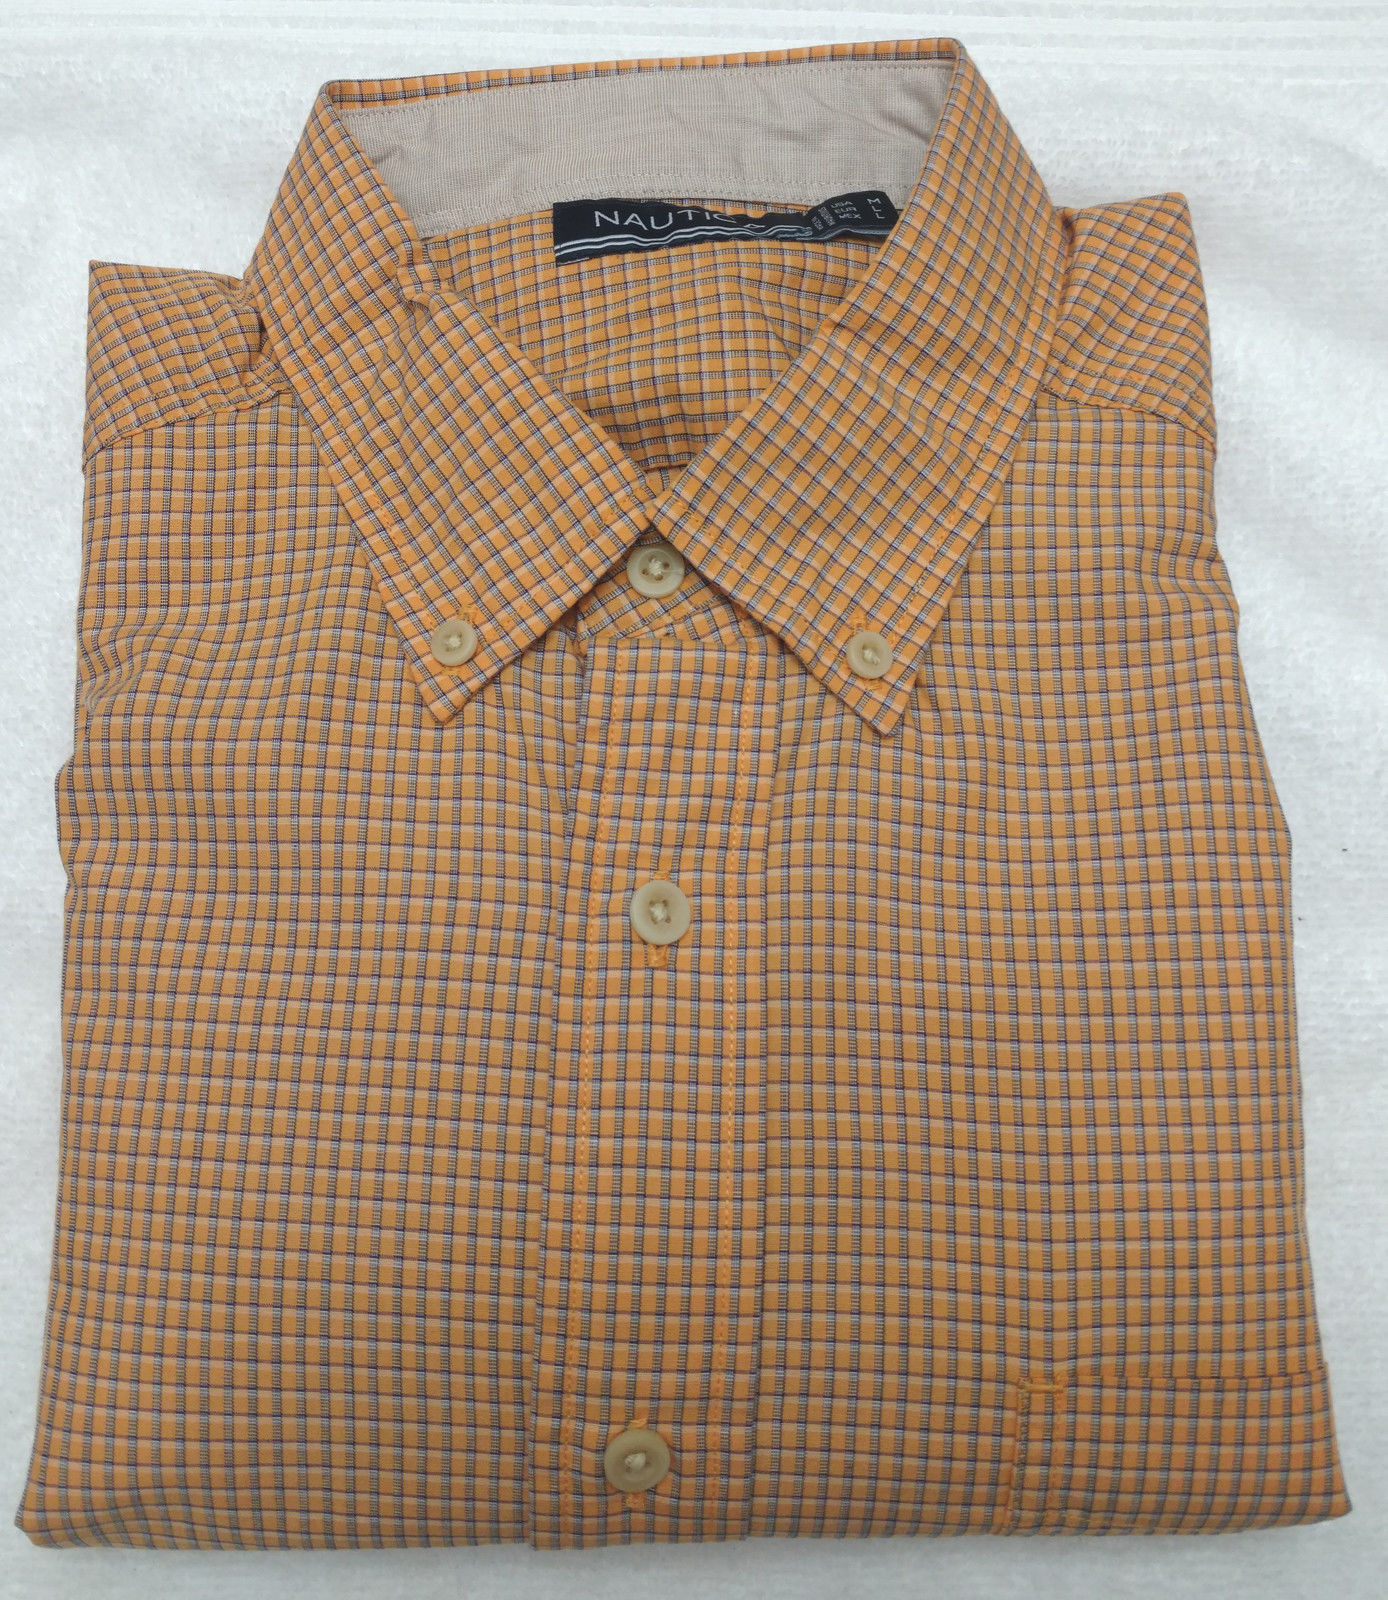 Nautica Men's Mini-Plaid Long Sleeve Dress Shirt Orange Sorbet Medium